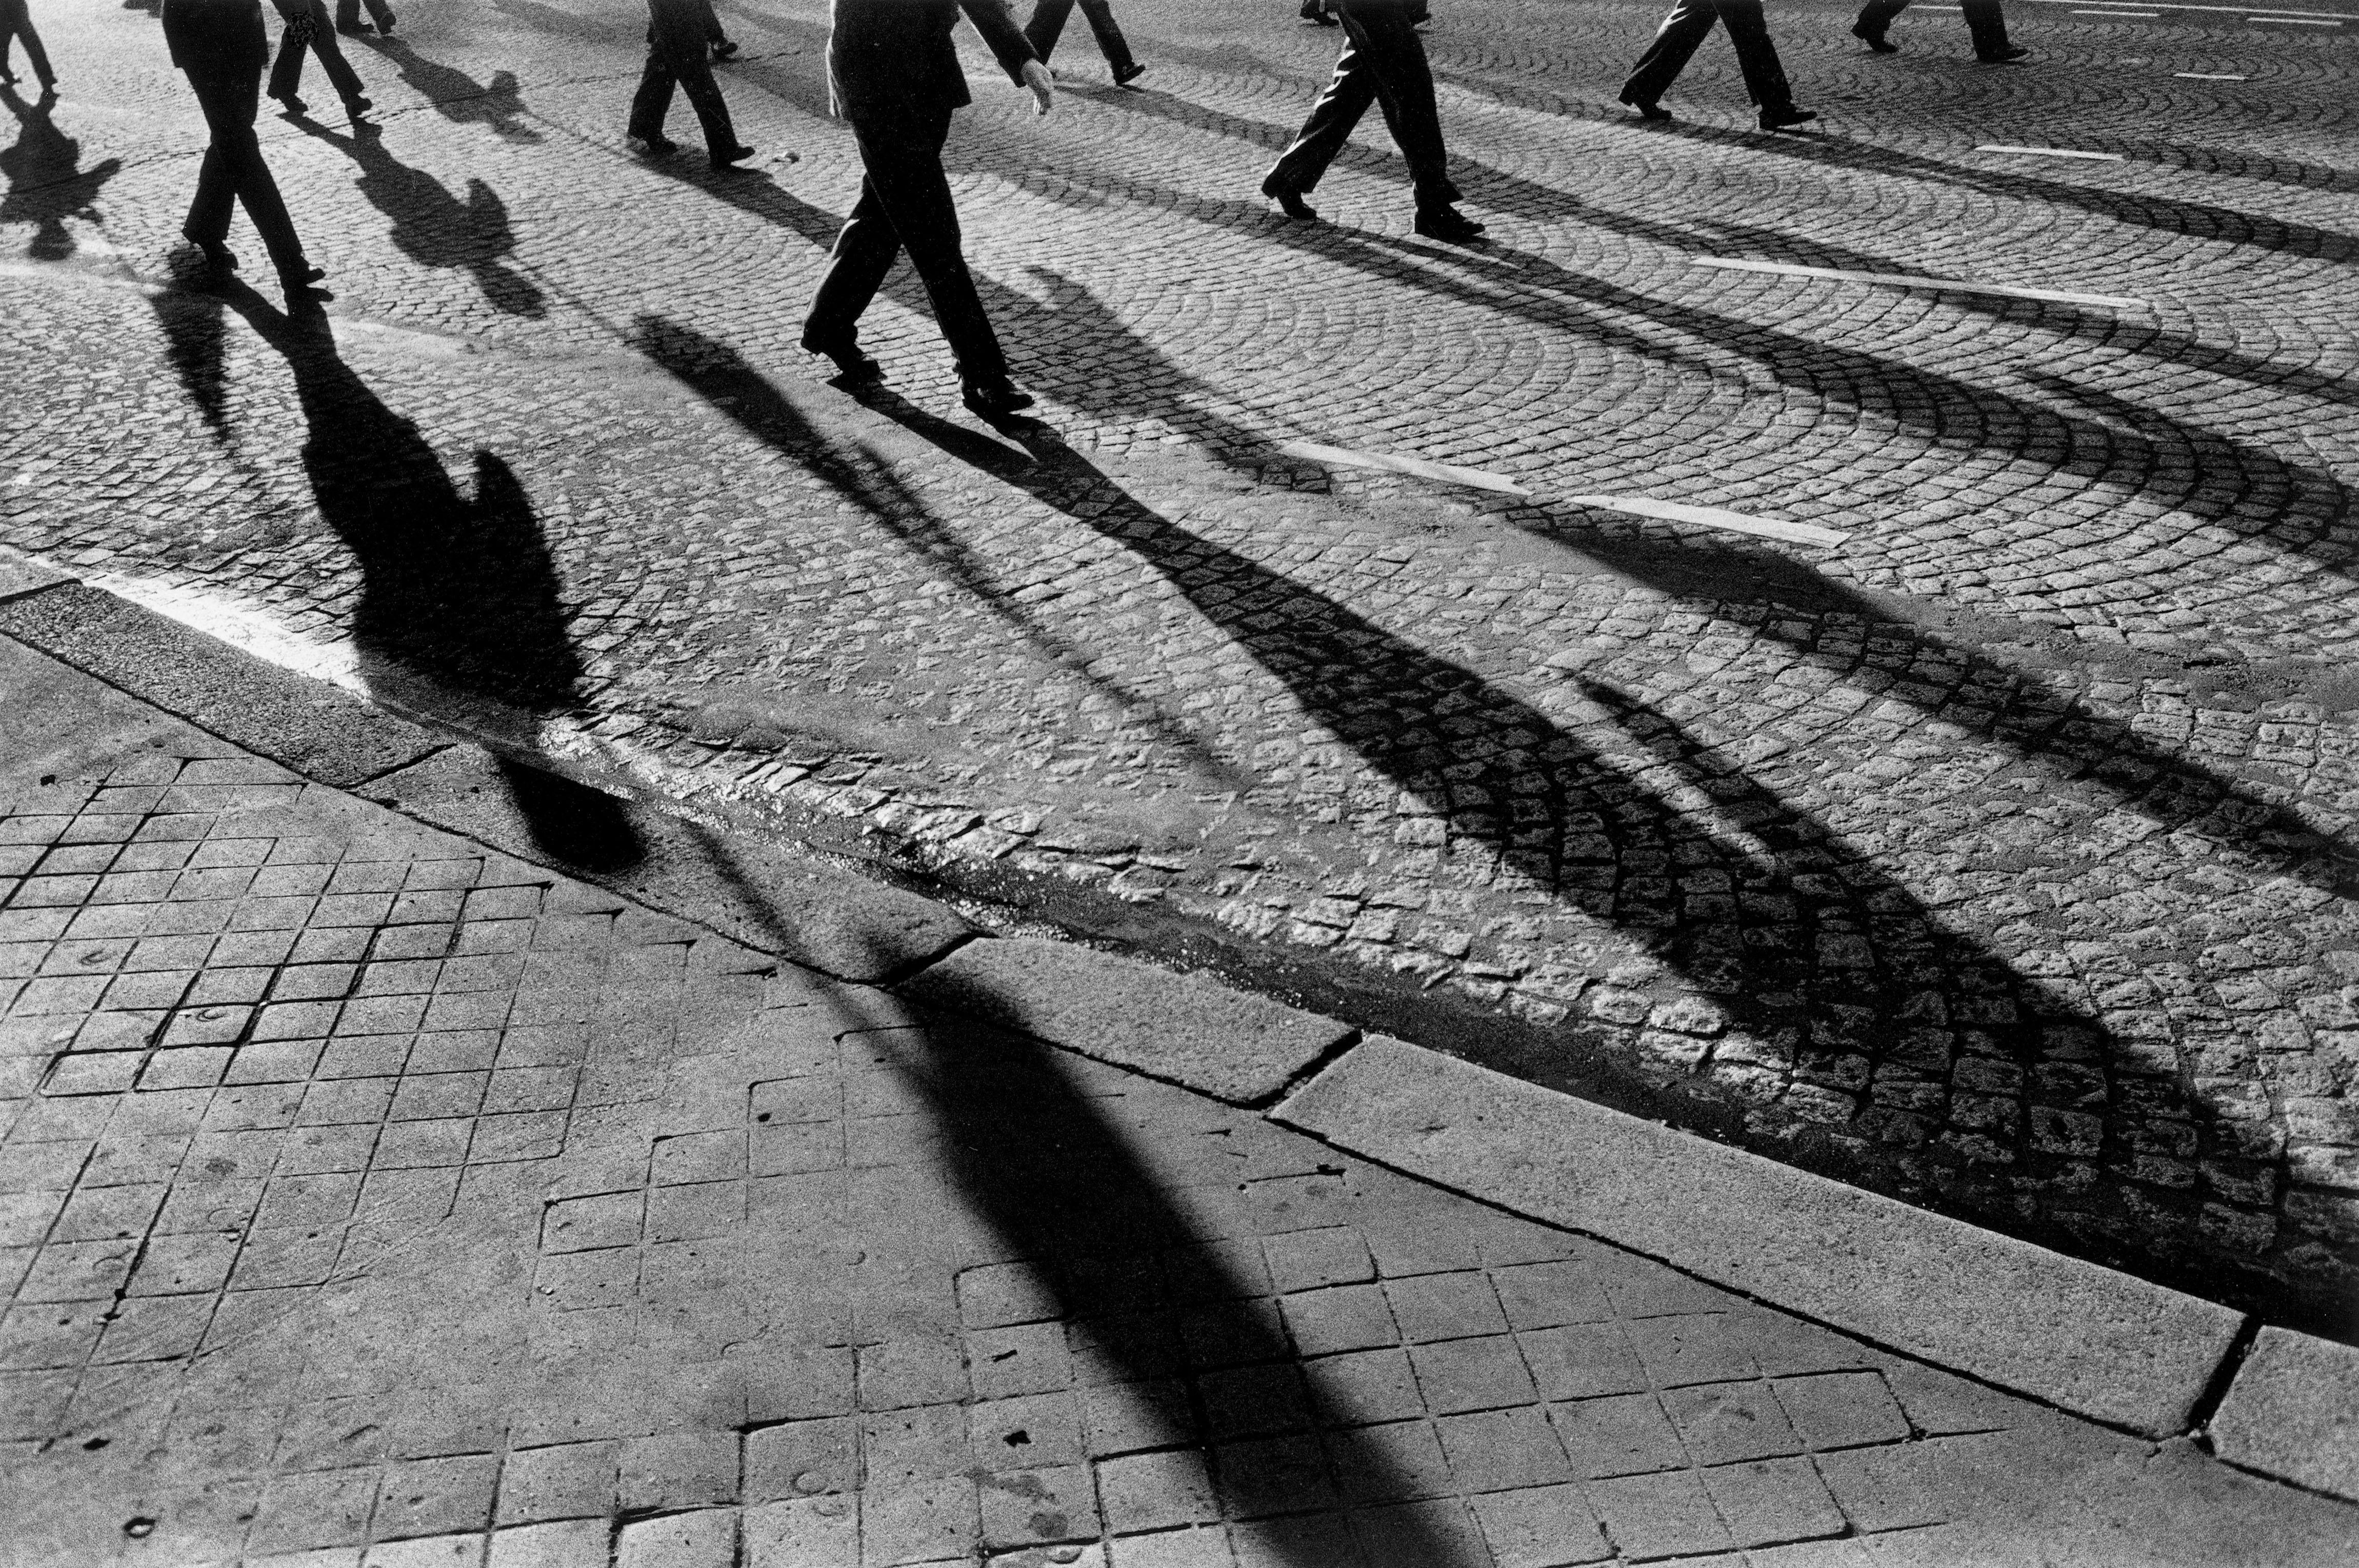 Josef Koudelka: Franciaország, 1980<br />© Josef Koudelka / Magnum Photos © Centre Pompidou